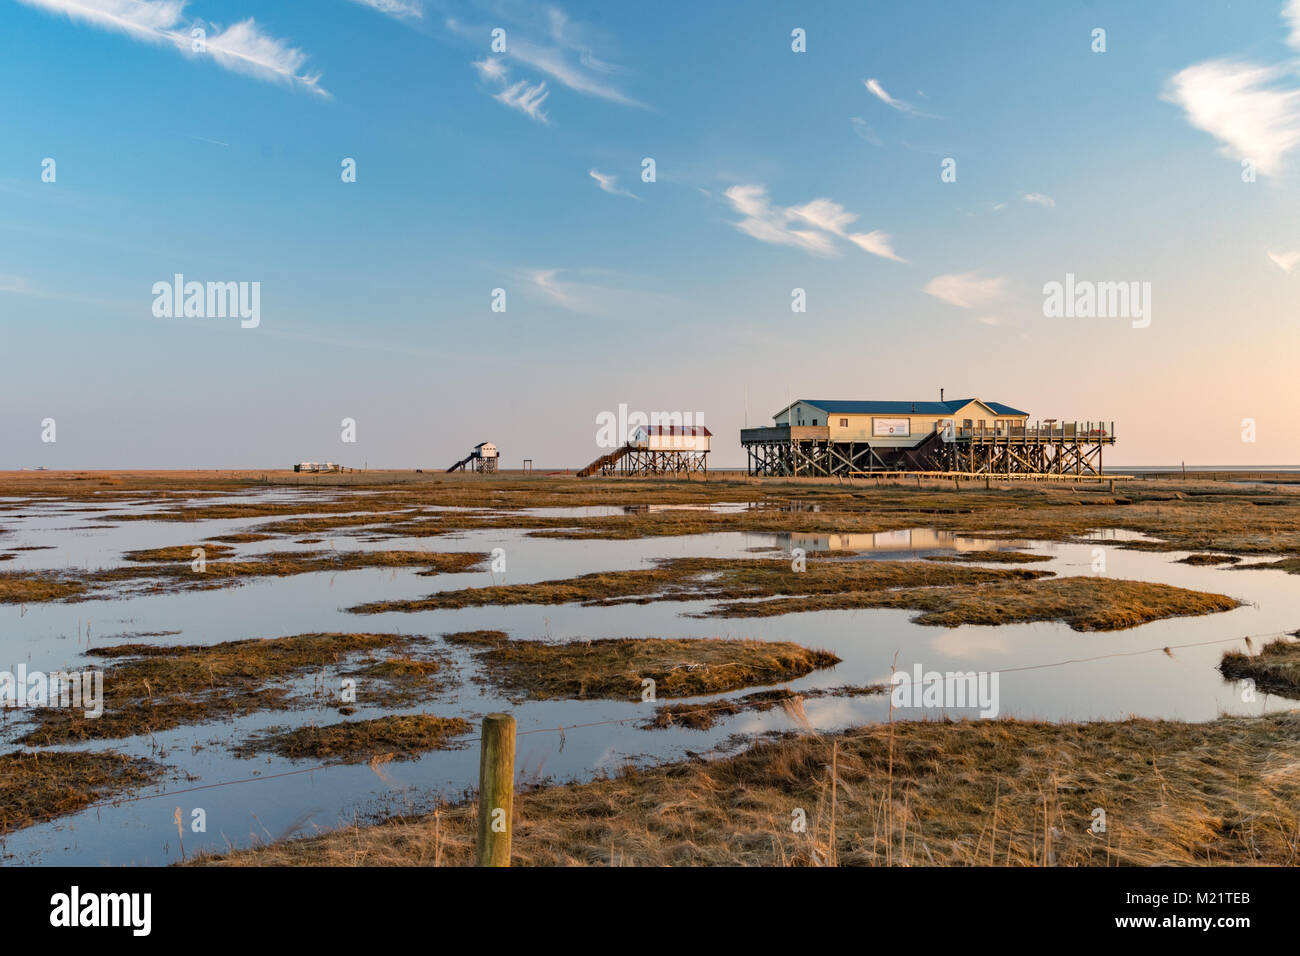 Die berühmten Pfahlbauten im Wattenmeer von Sankt Peter-Ording. Stockbild